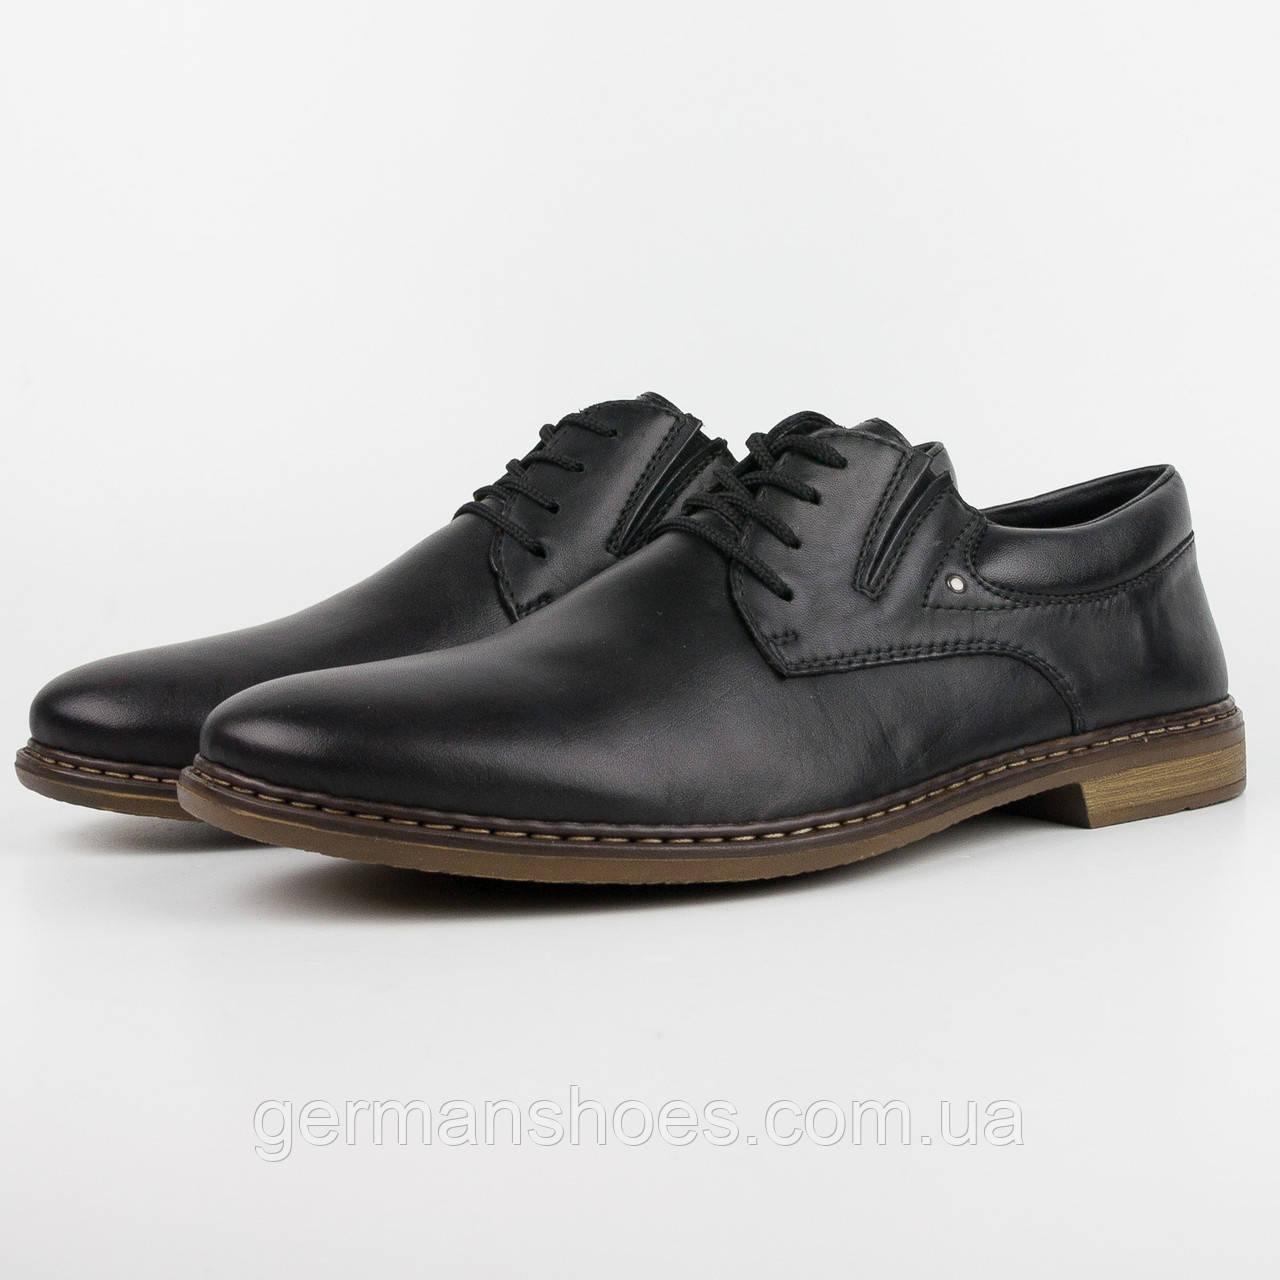 fdbcfab3 Туфли мужские Rieker 13419-00 - Интернет-магазин обуви